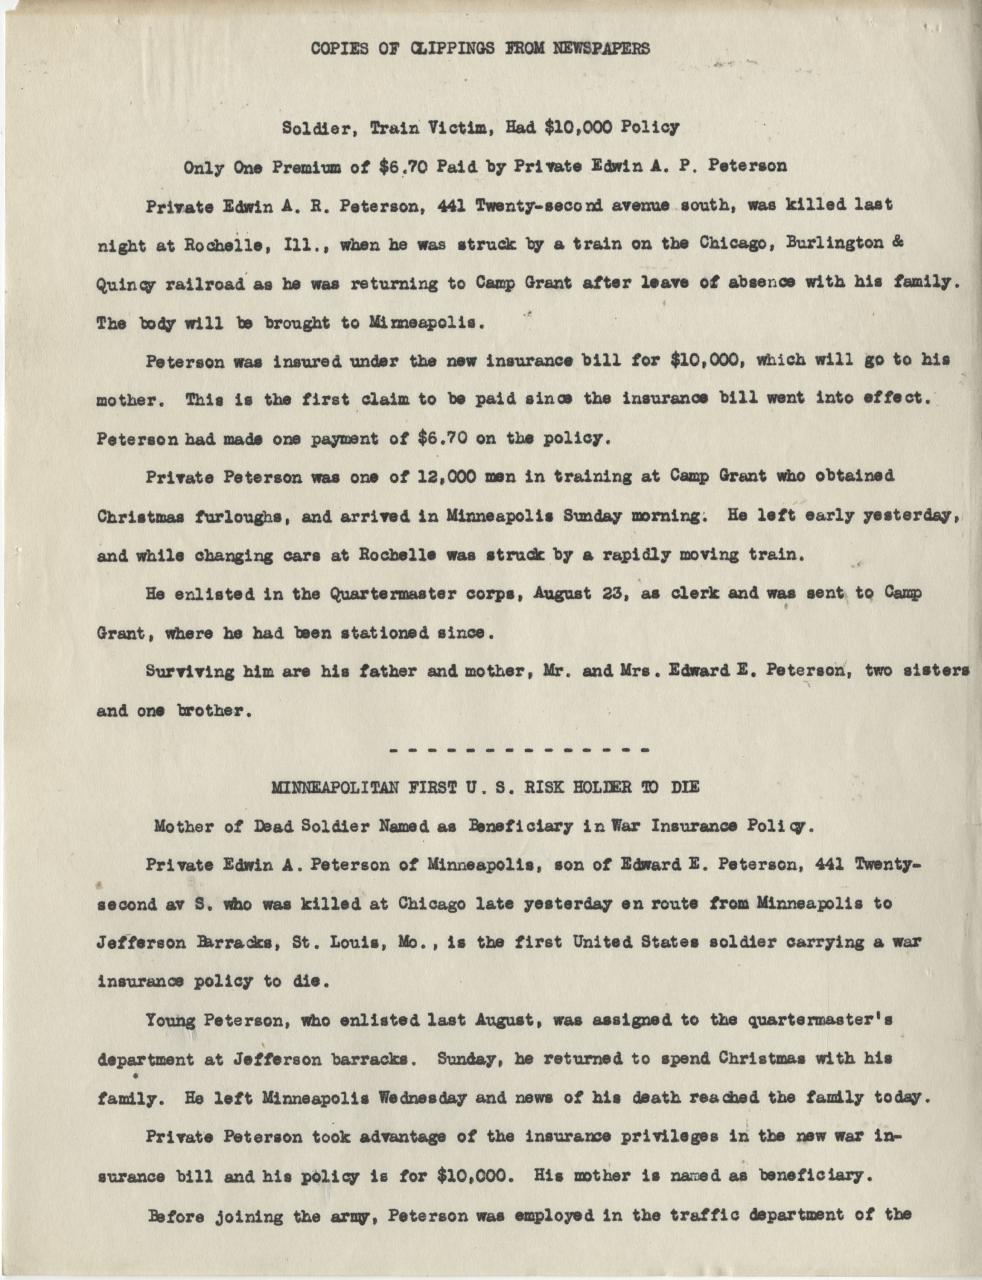 First U S  Risk Holder Dies | Minnesota Historical Society